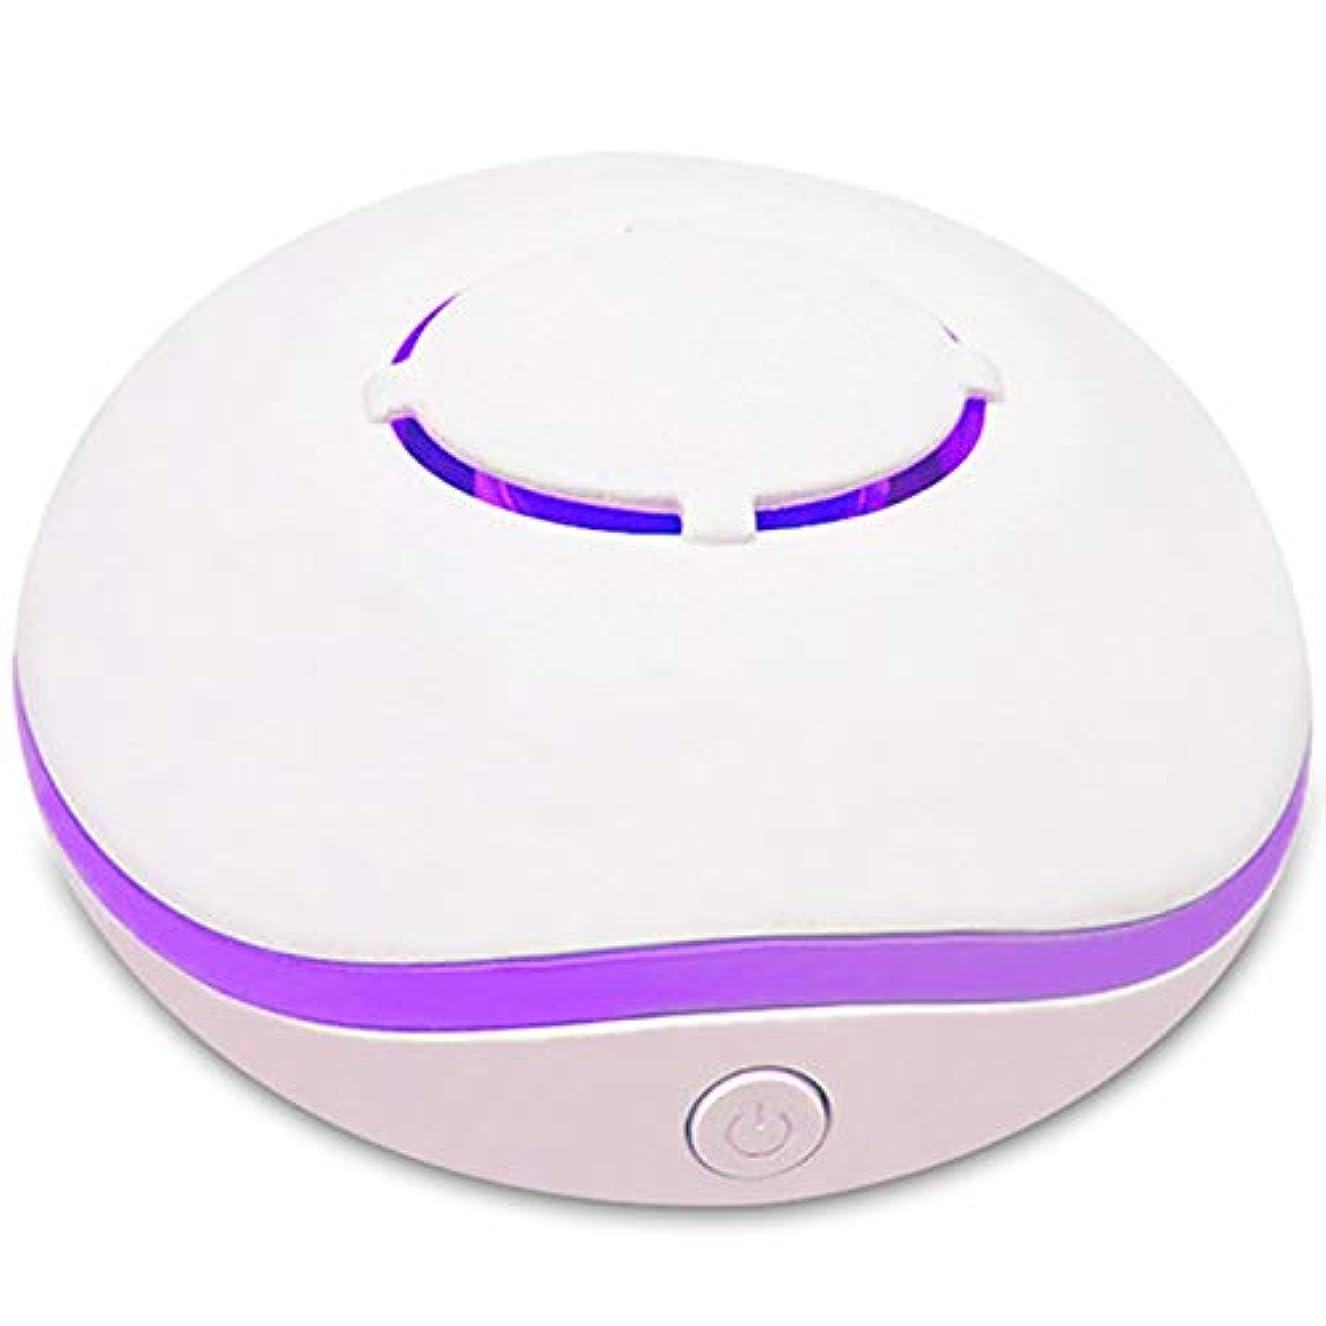 SODIAL 無水アロマ?ミニディフューザー、エッセンシャルオイルの携帯用ネブライザー、アロマオイルの拡散、家庭用、2つの接続電源モード、白色